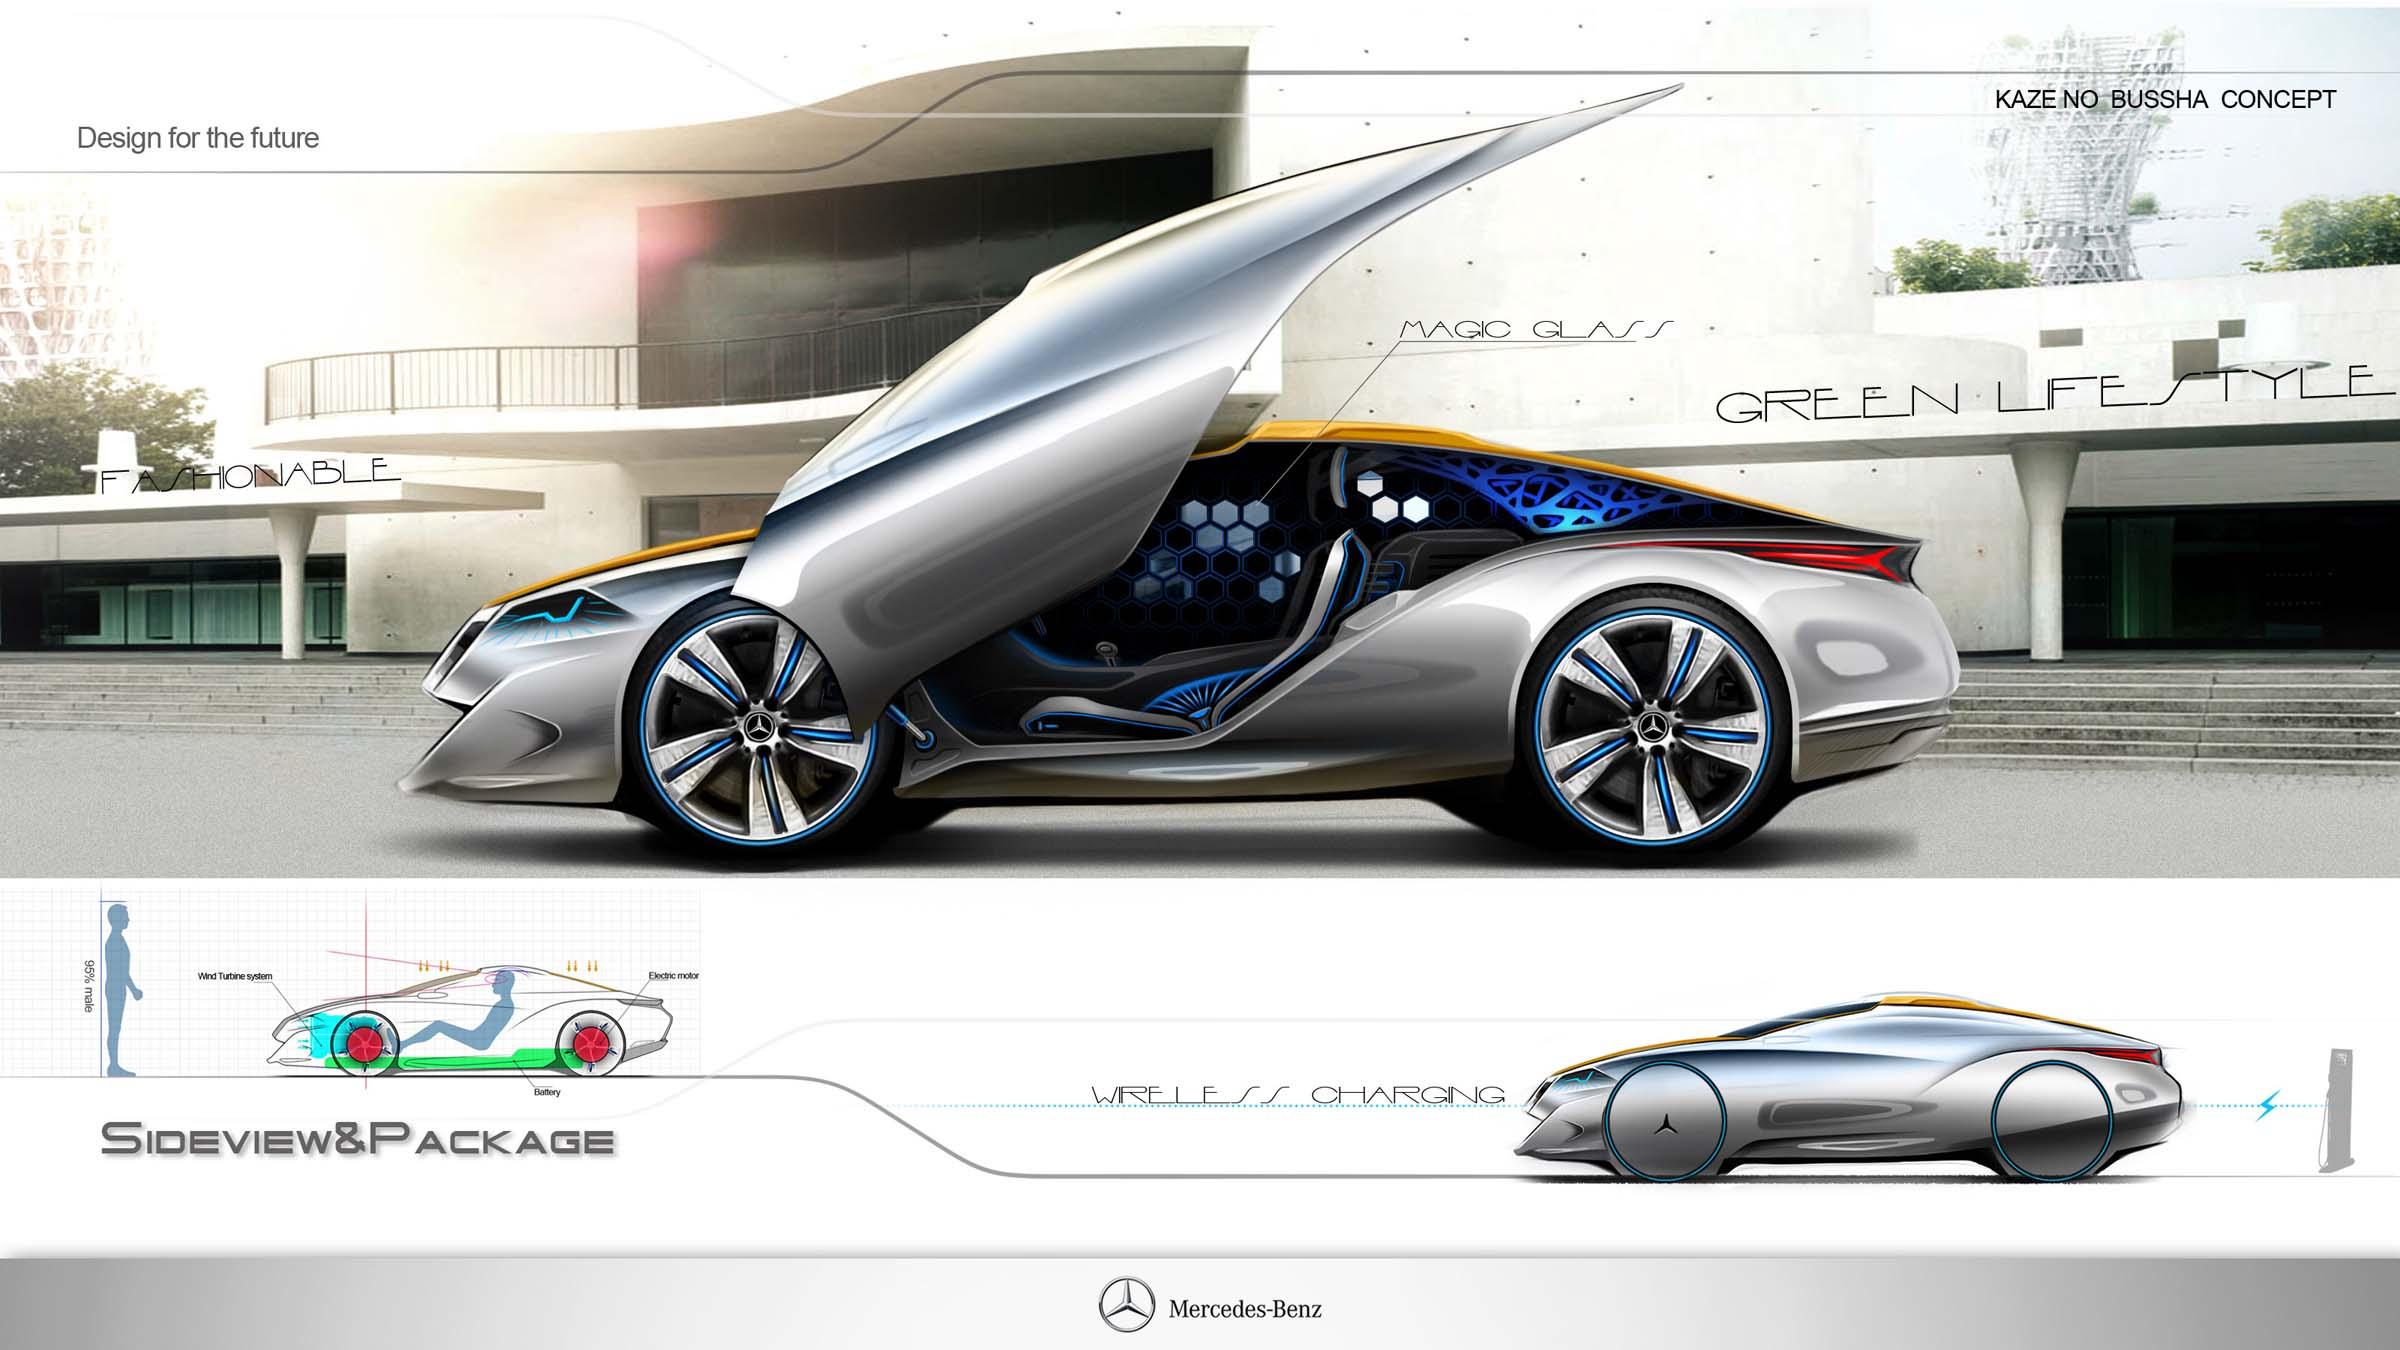 Mercedes benz kazenobusha concept electric vehicle by for Mercedes benz concept electric car